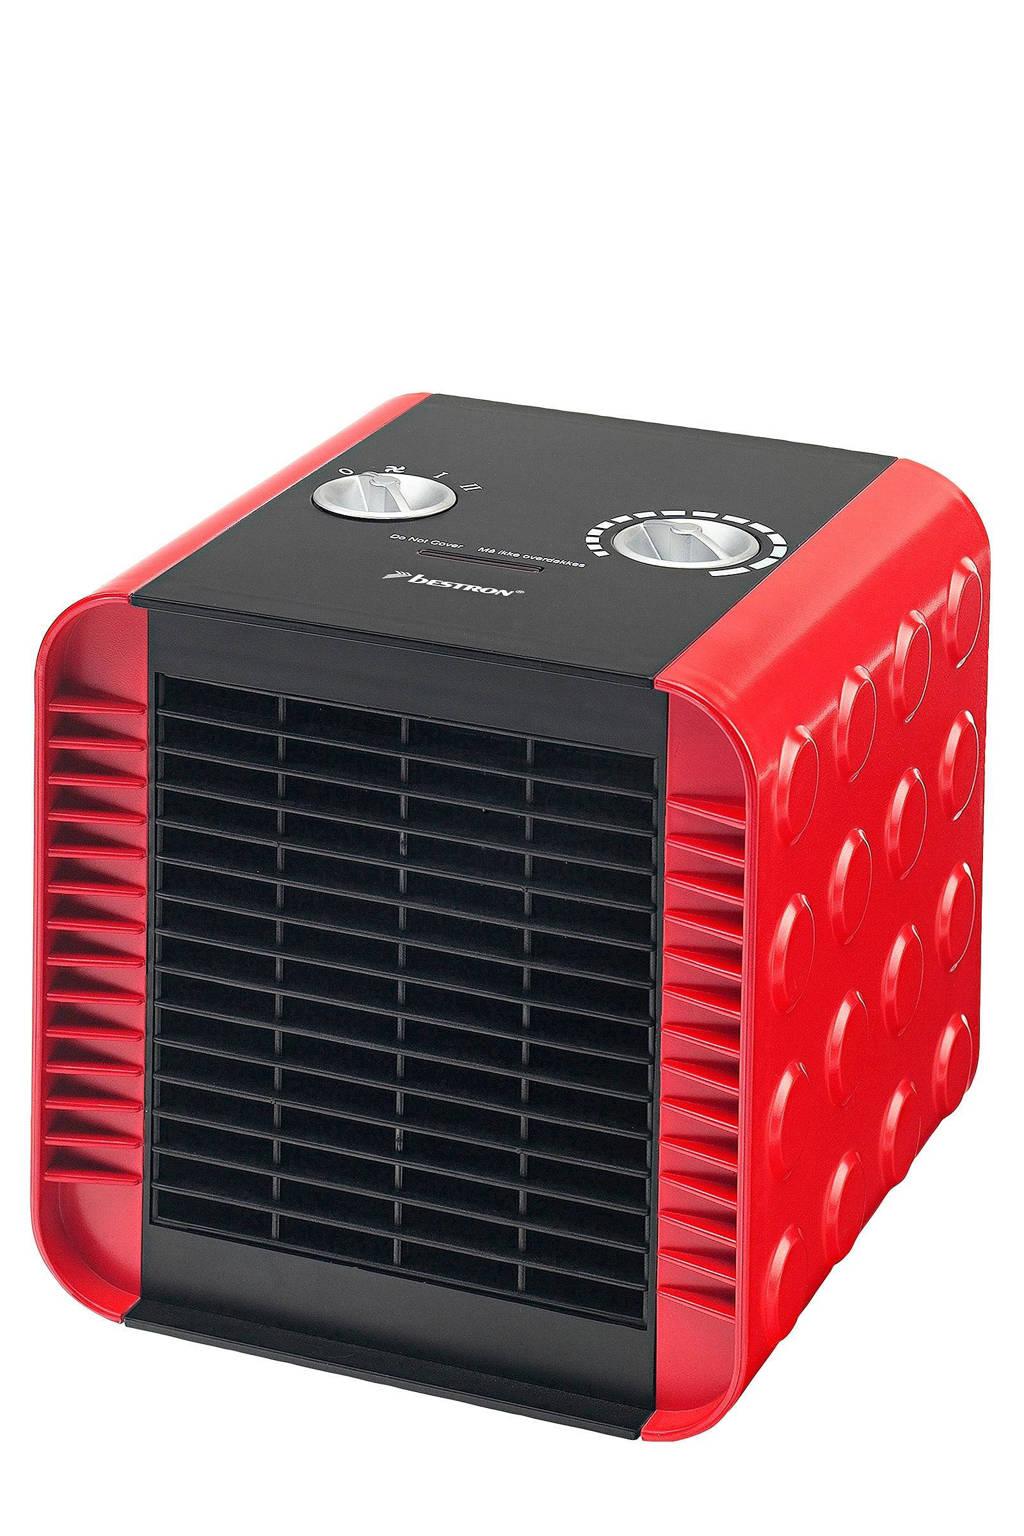 Bestron ACH1500R keramische ventilatorkachel, Zwart, Rood